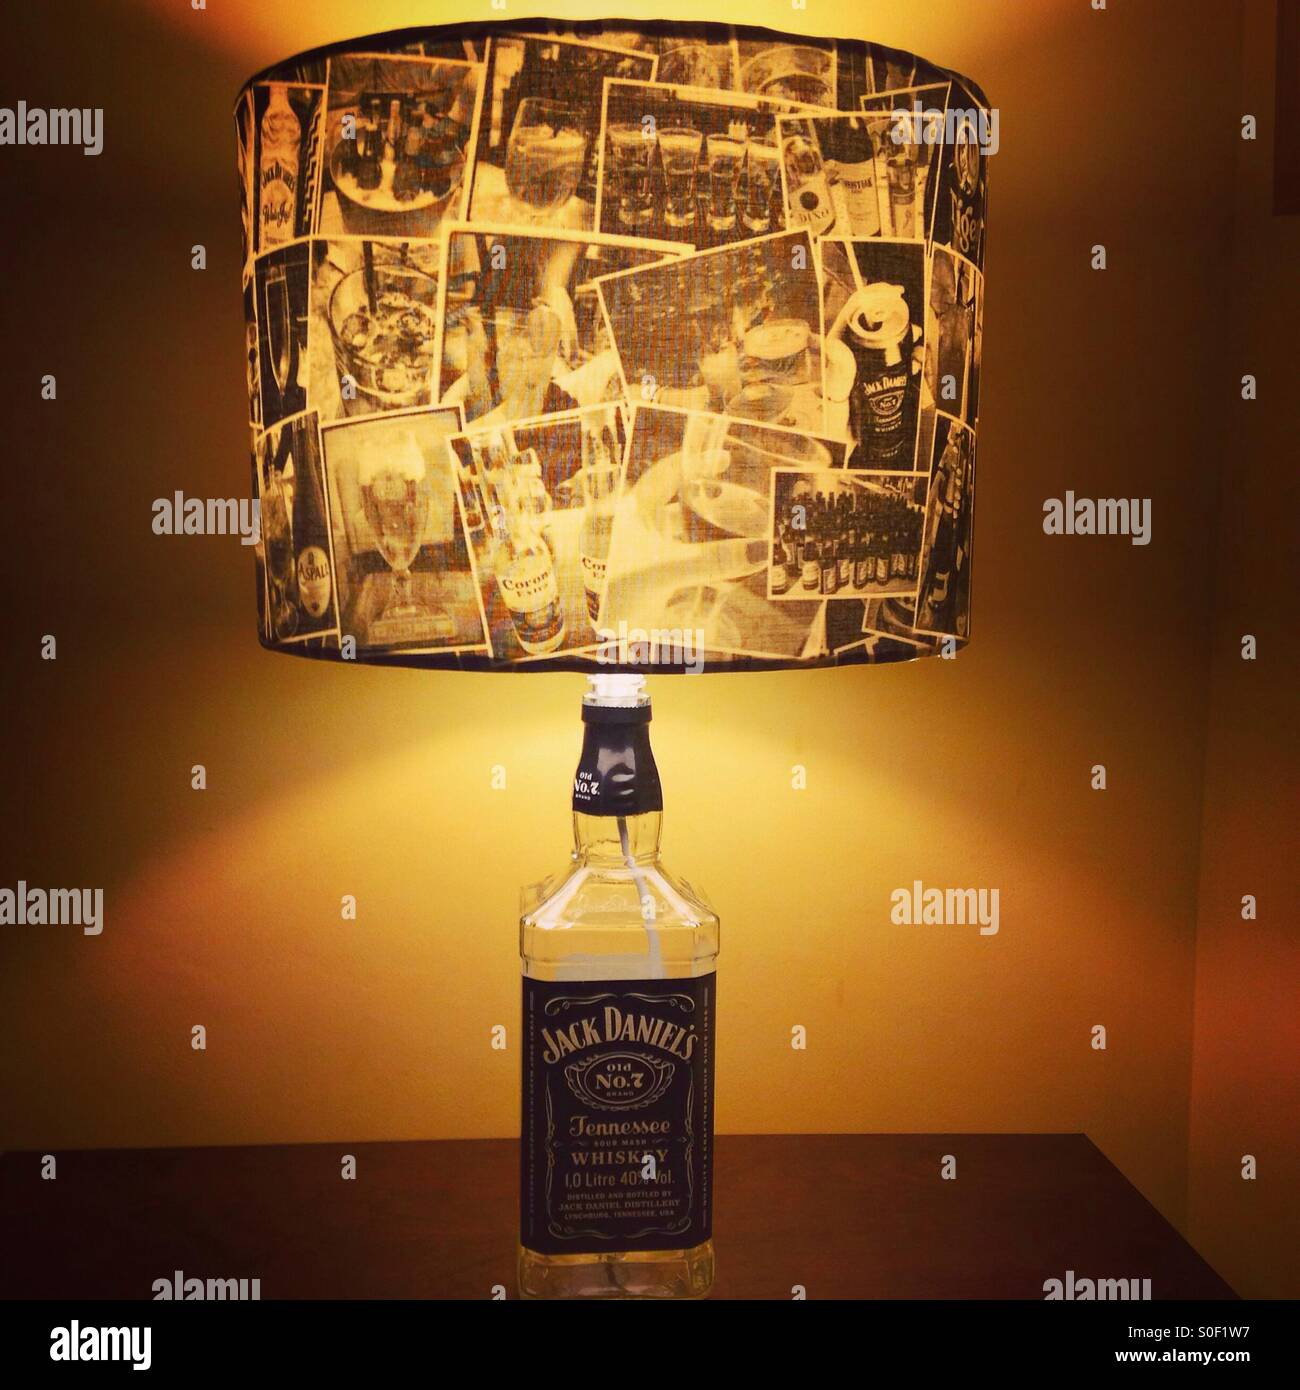 Jack Daniels Lampada Bottiglia Foto Immagine Stock